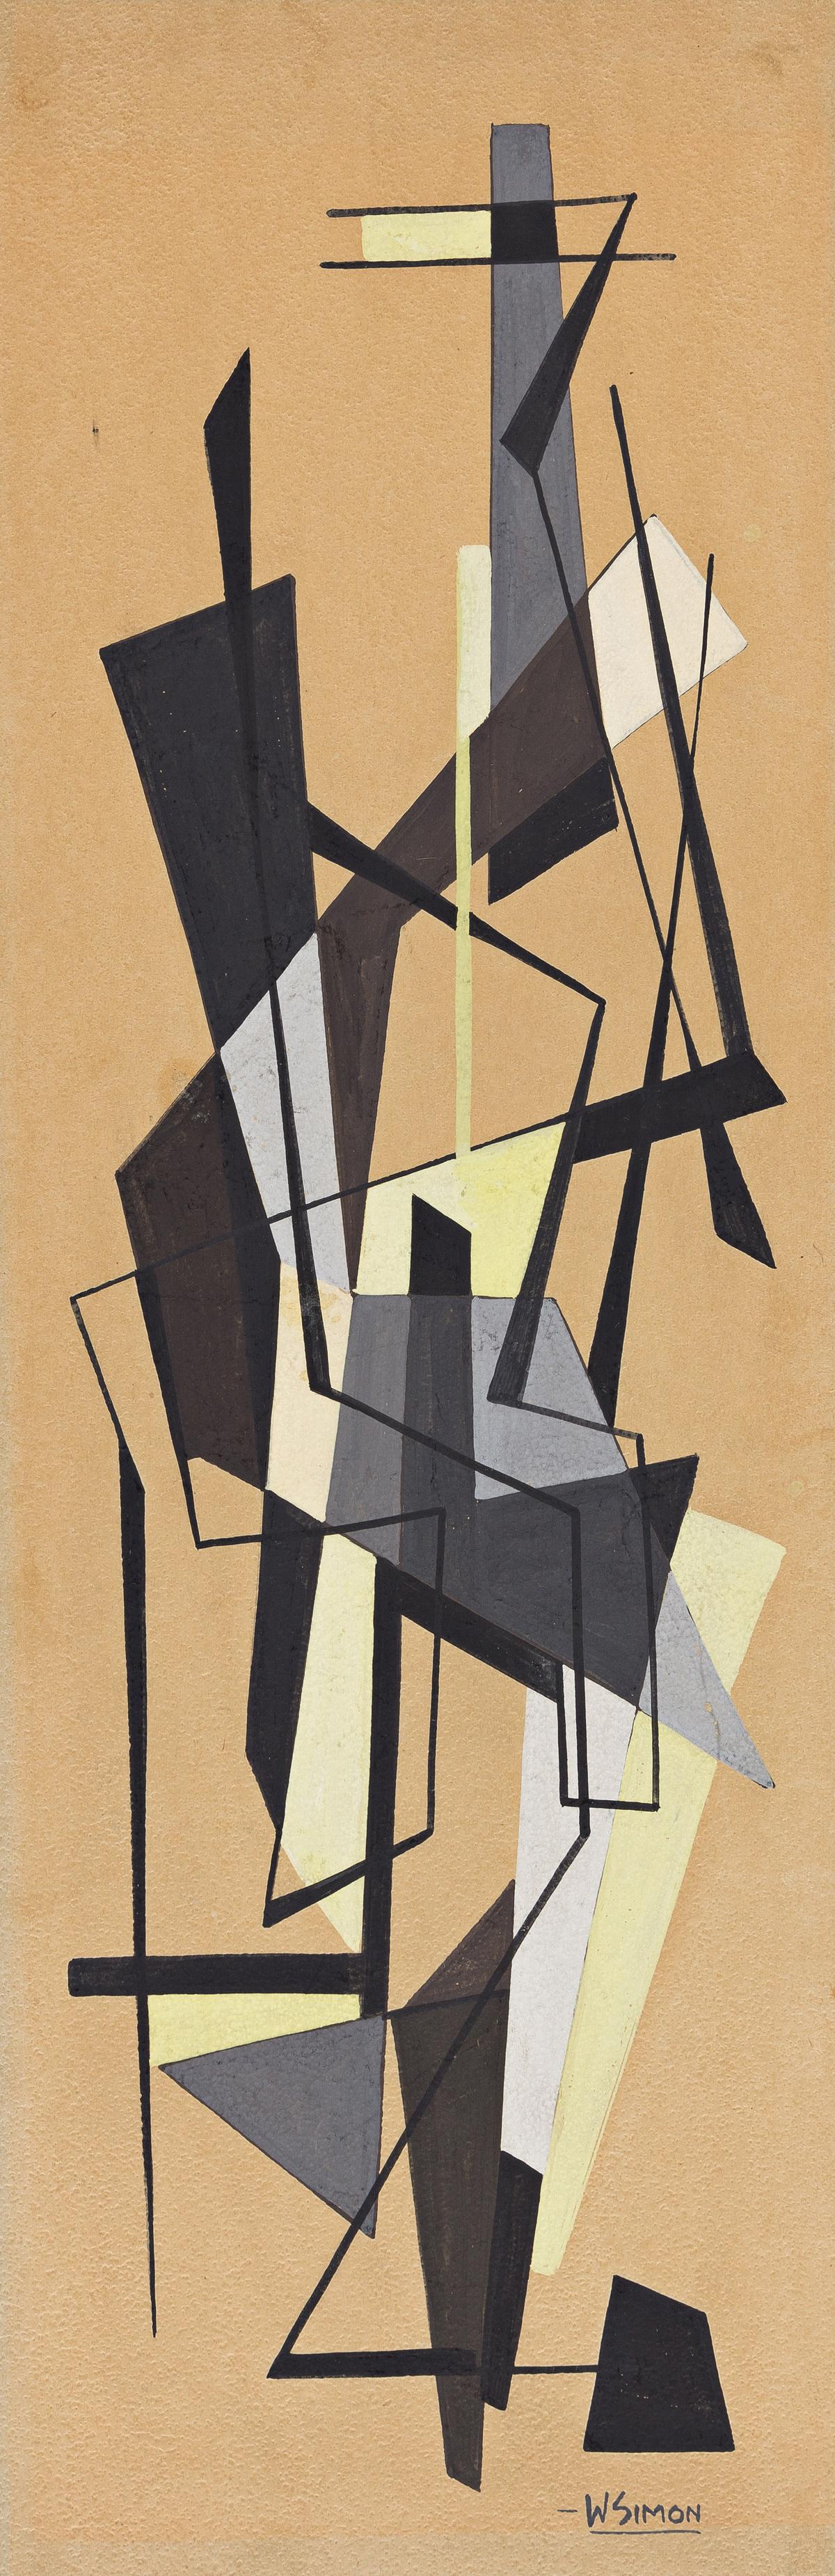 WALTER AUGUSTUS SIMON (1916 - 1979) Untitled (Study in Grey).